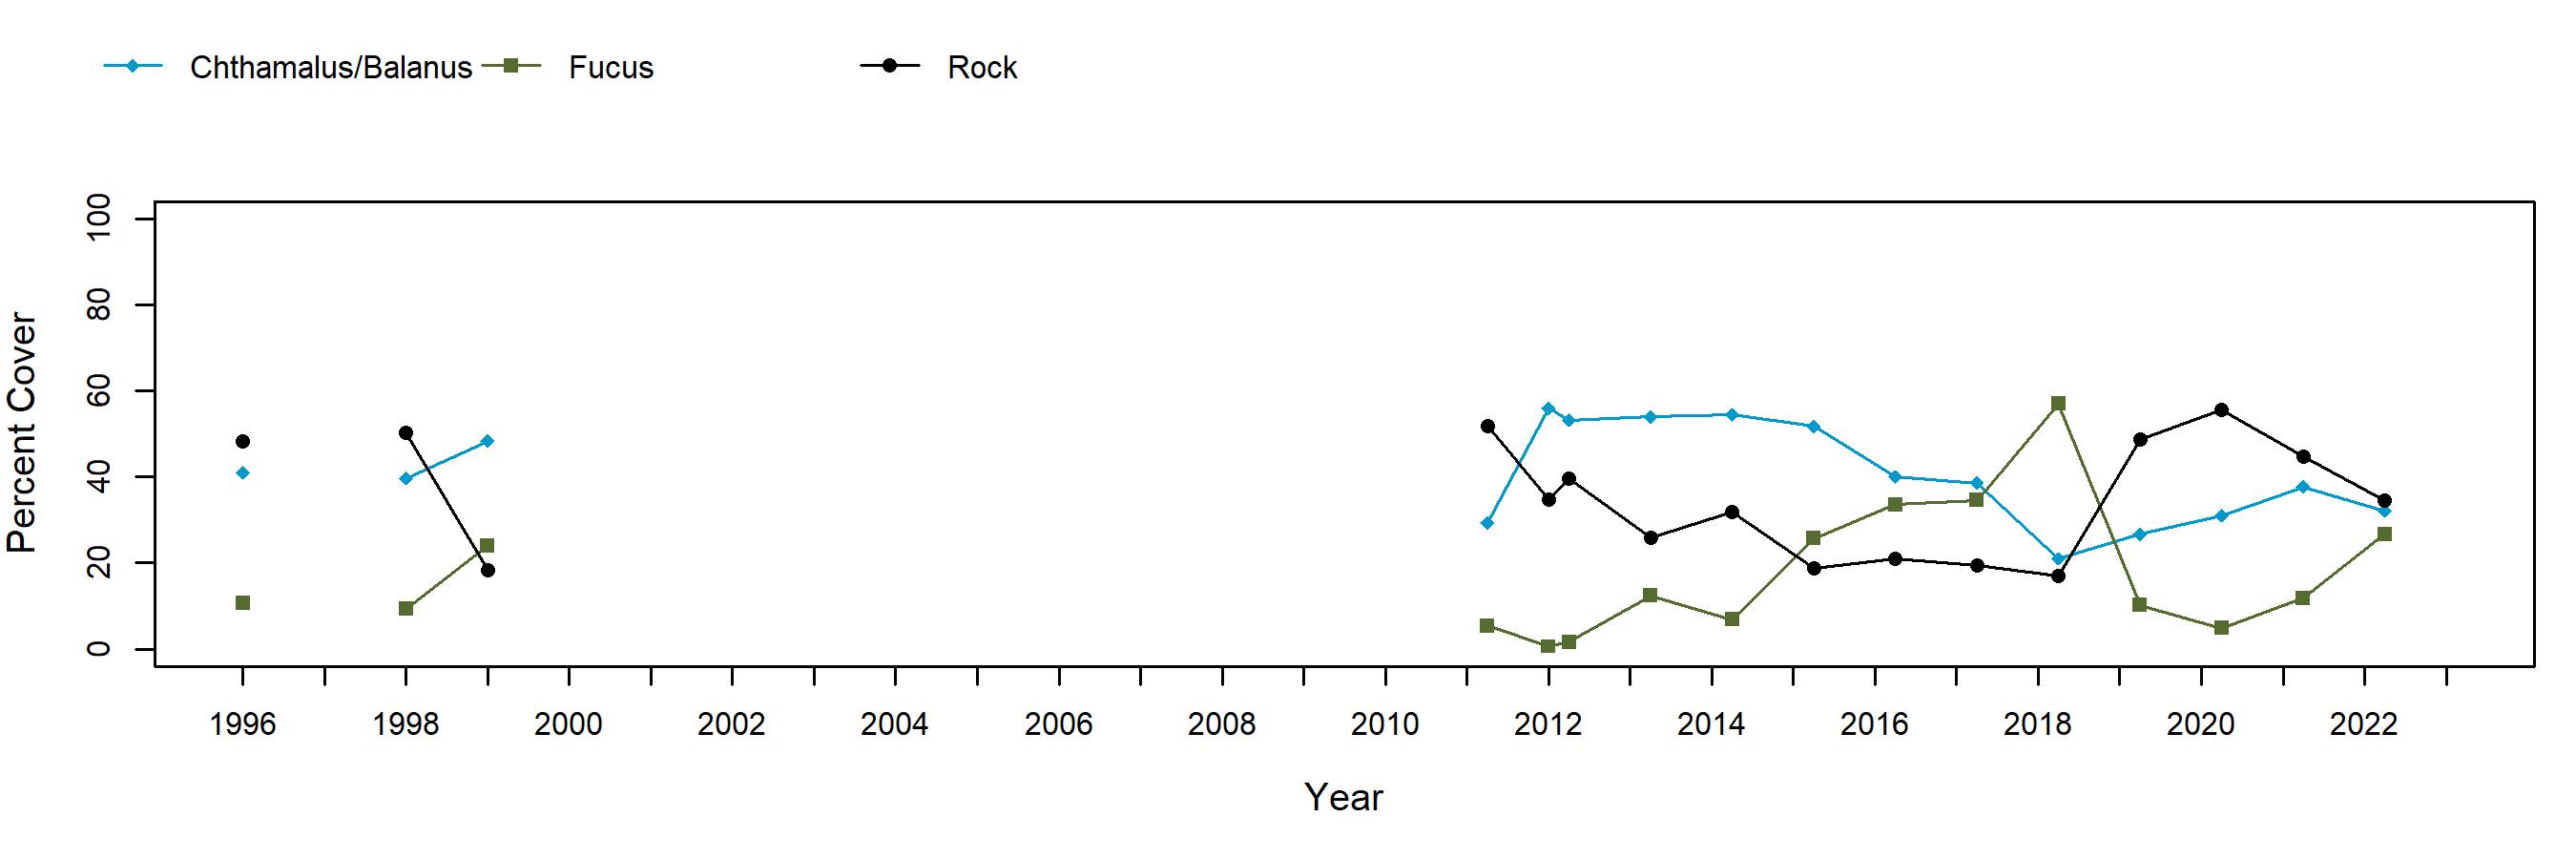 Sage Rock barnacle trend plot